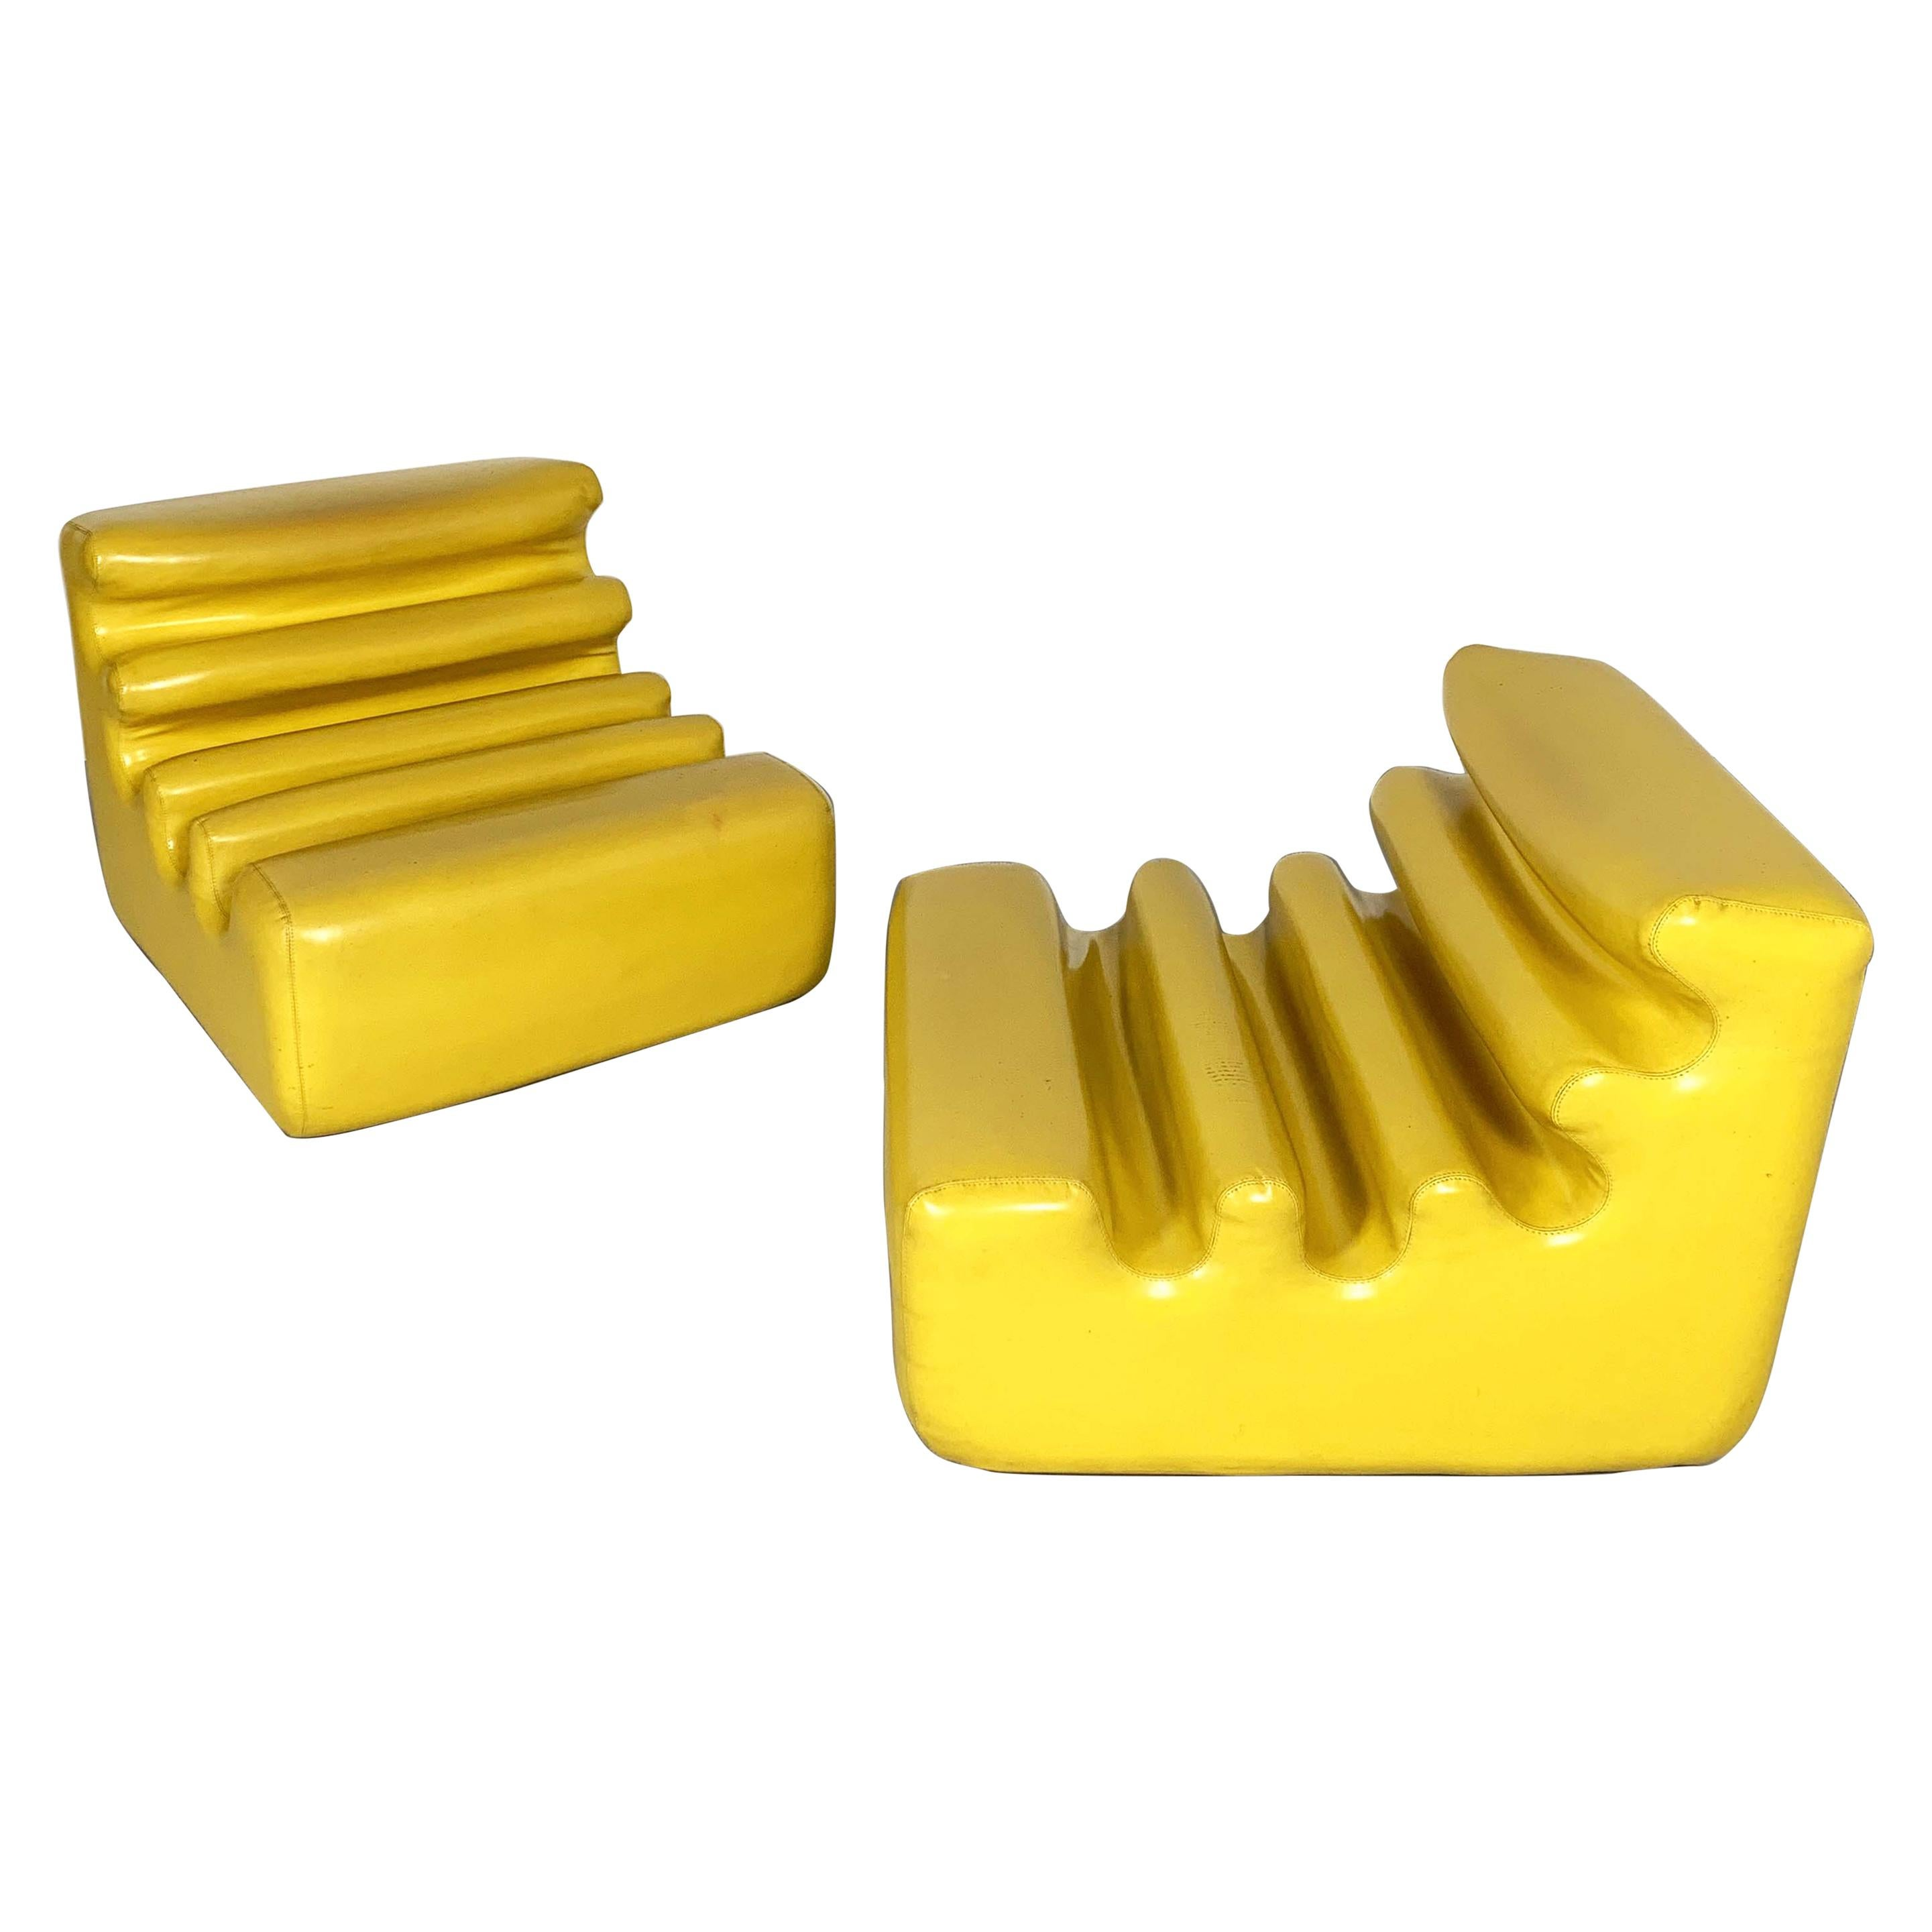 Yellow Karelia Lounge Chairs by Liisi Beckmann for Zanotta, 1970s